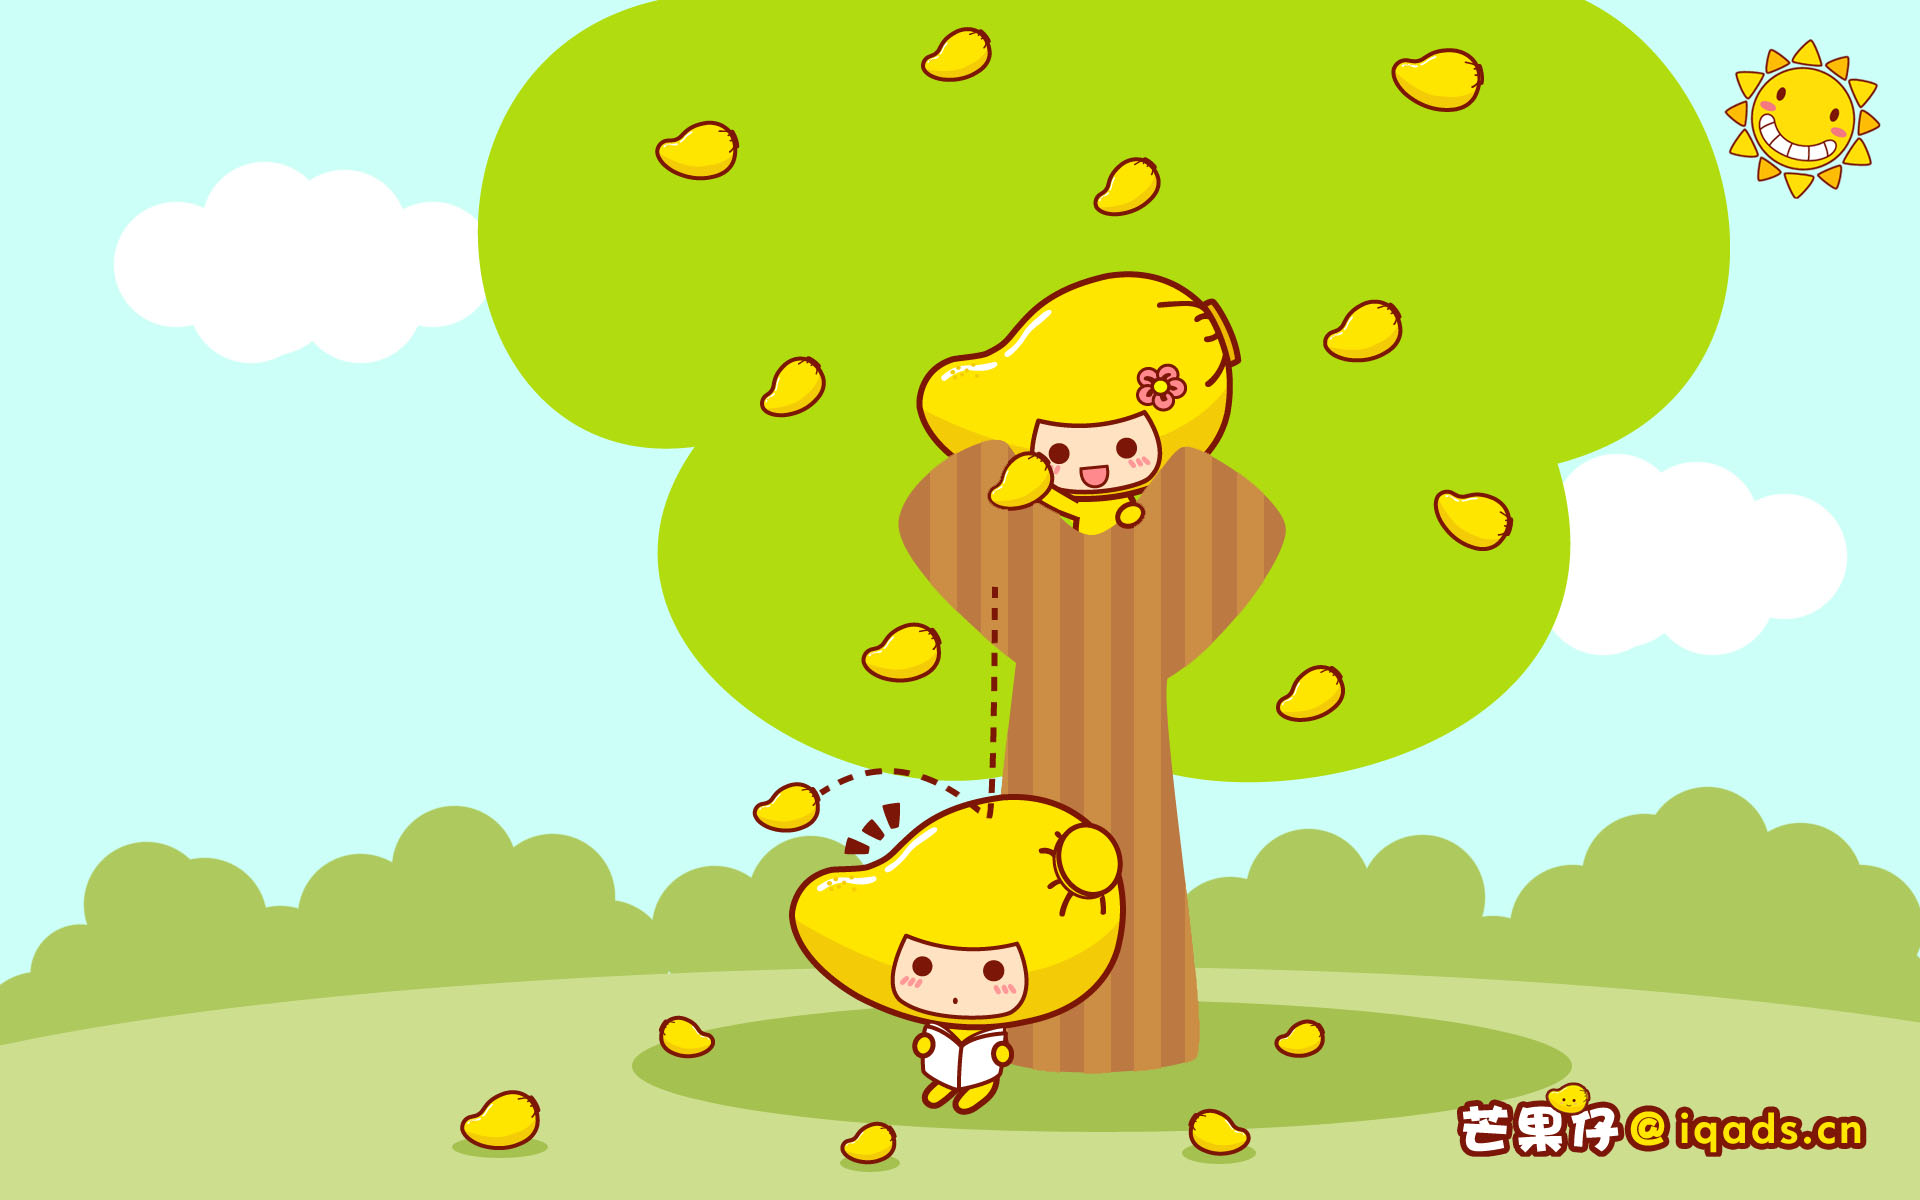 Mango Fruit Tree Images Wallpaper Cartoon Picture Of Mango Tree 1920x1200 Wallpaper Teahub Io Download mango tree images and photos. mango fruit tree images wallpaper